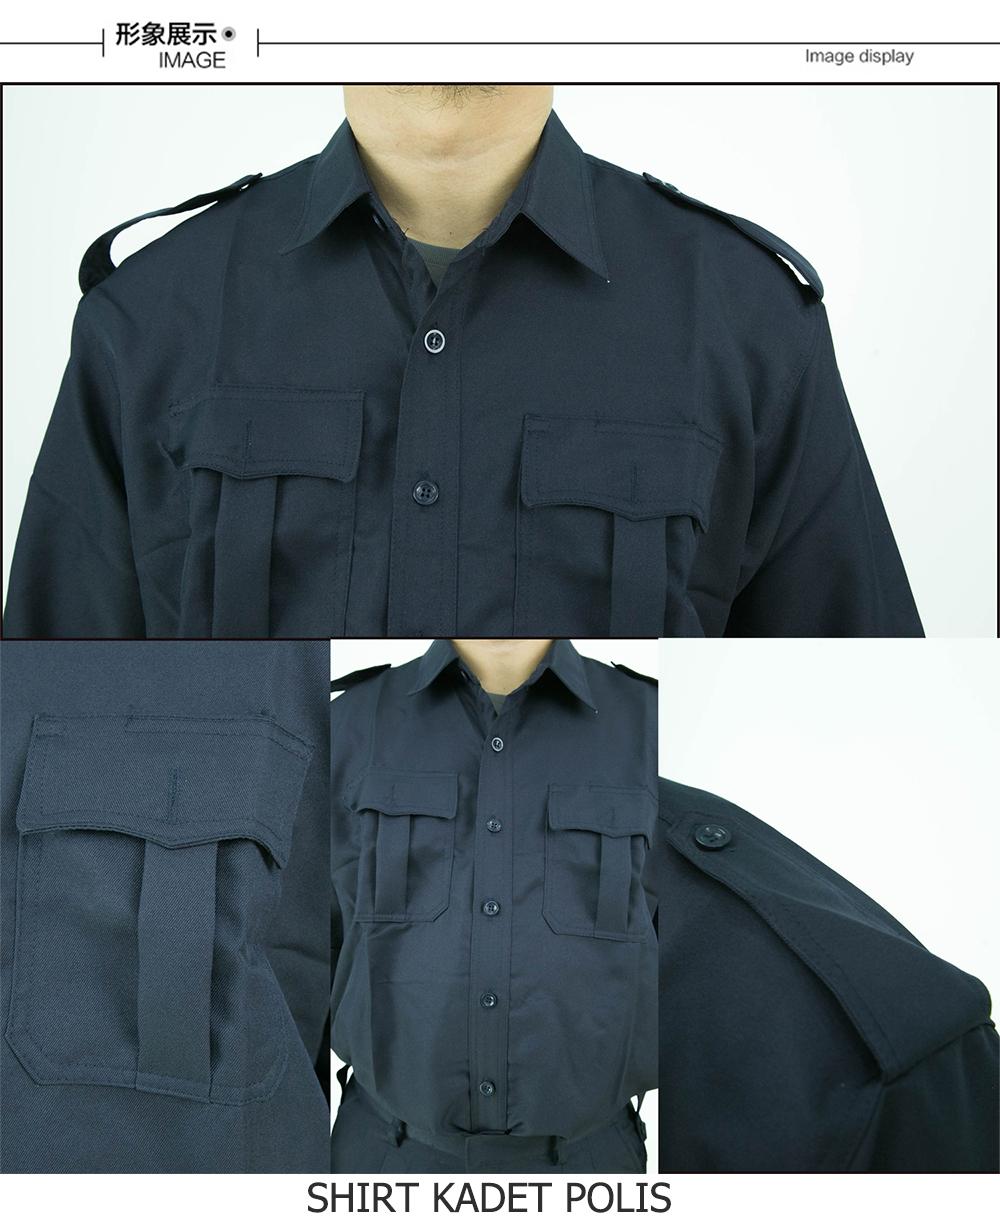 CY 2907 SCHOOL UNIFORM SHIRT KADET POLIS / KENEJA UNIFORM KADET POLIS / CADET POLICE SCHOOL SHIRT